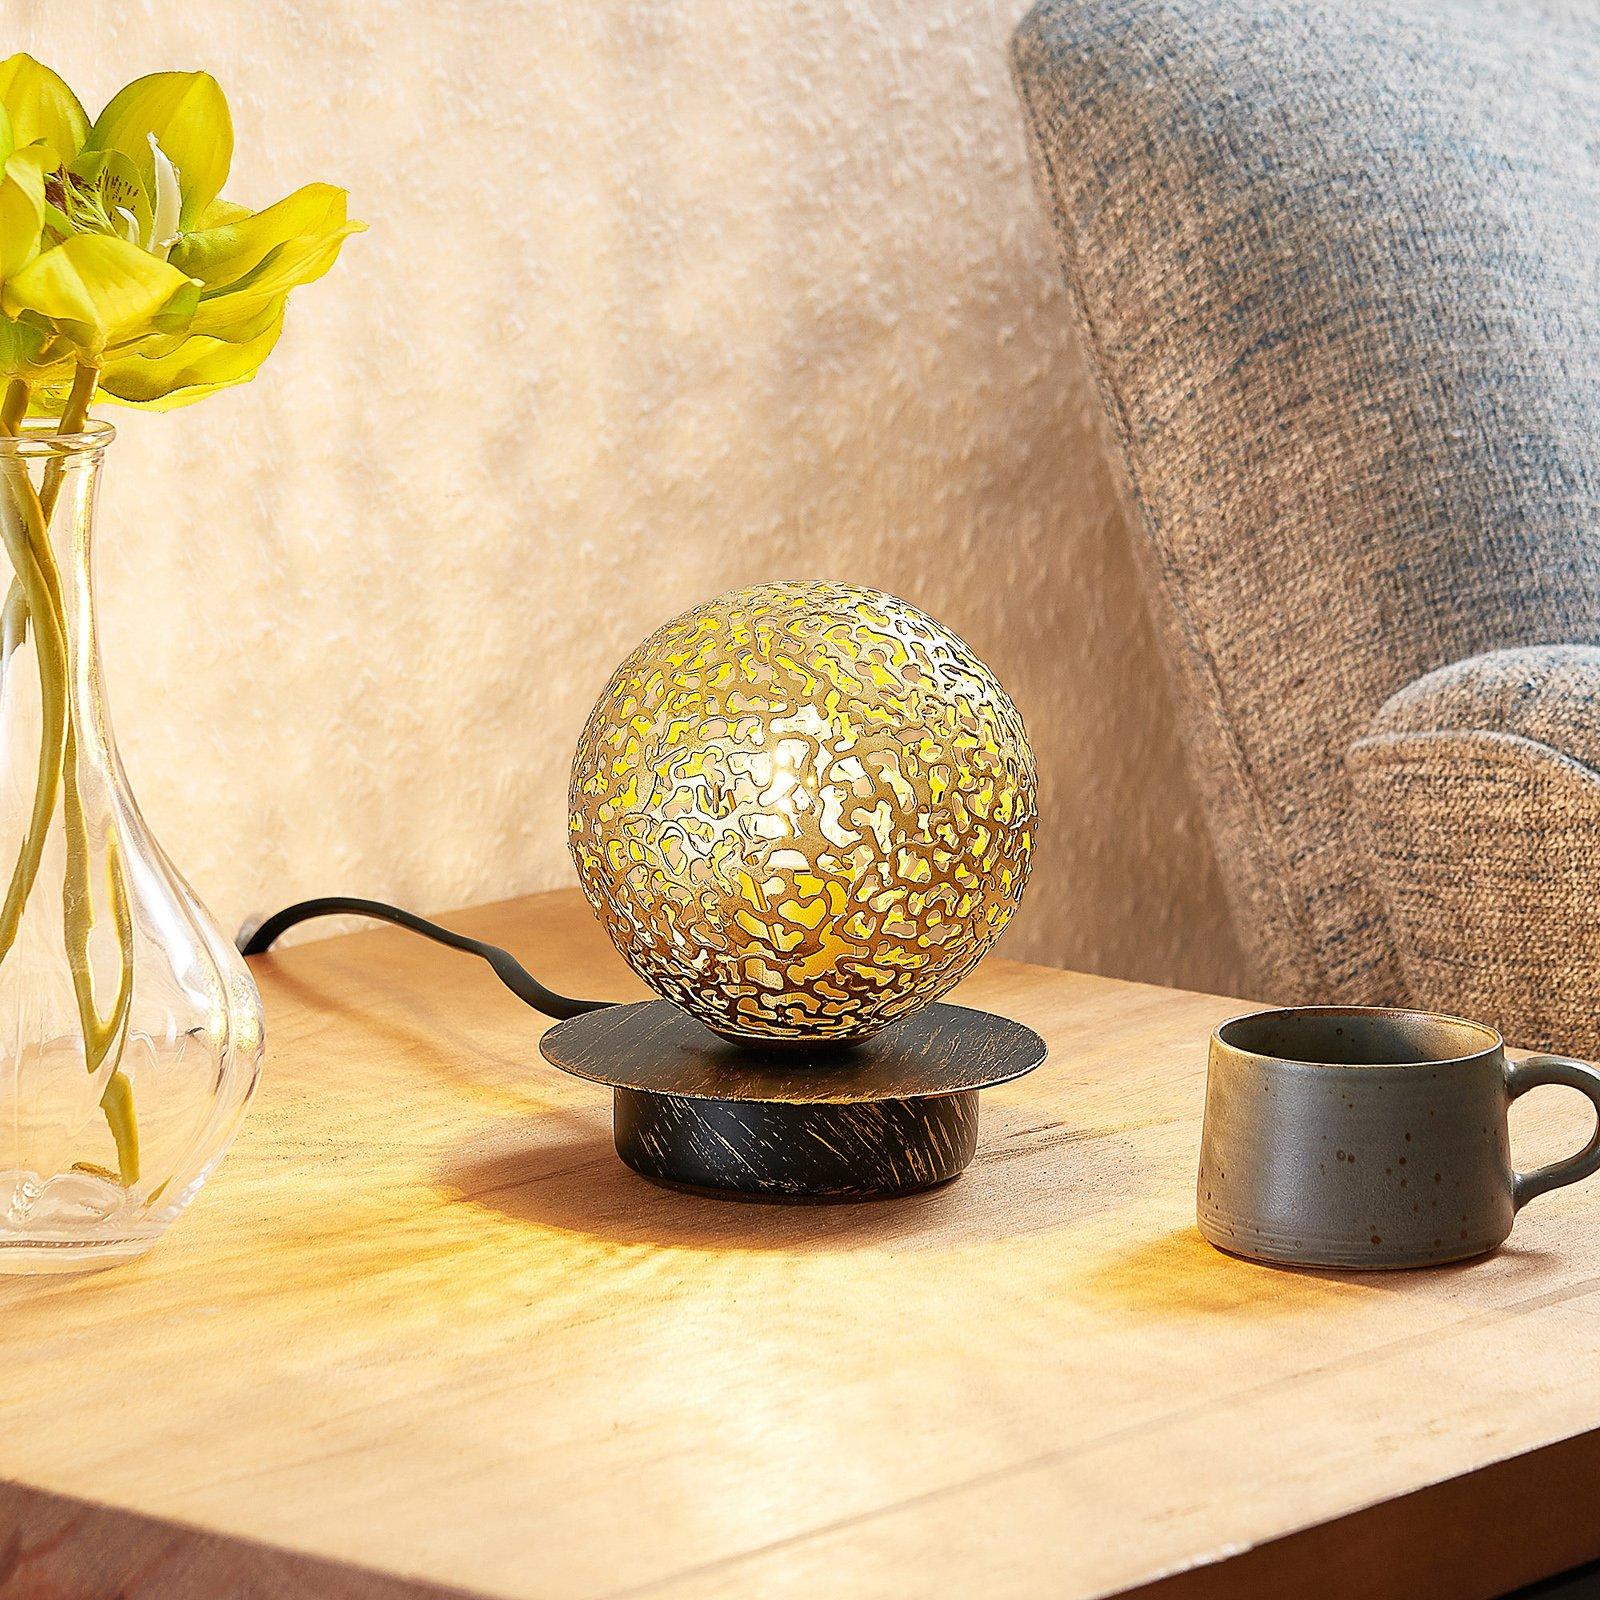 Lucande Evory bordlampe, 1 lyskilde